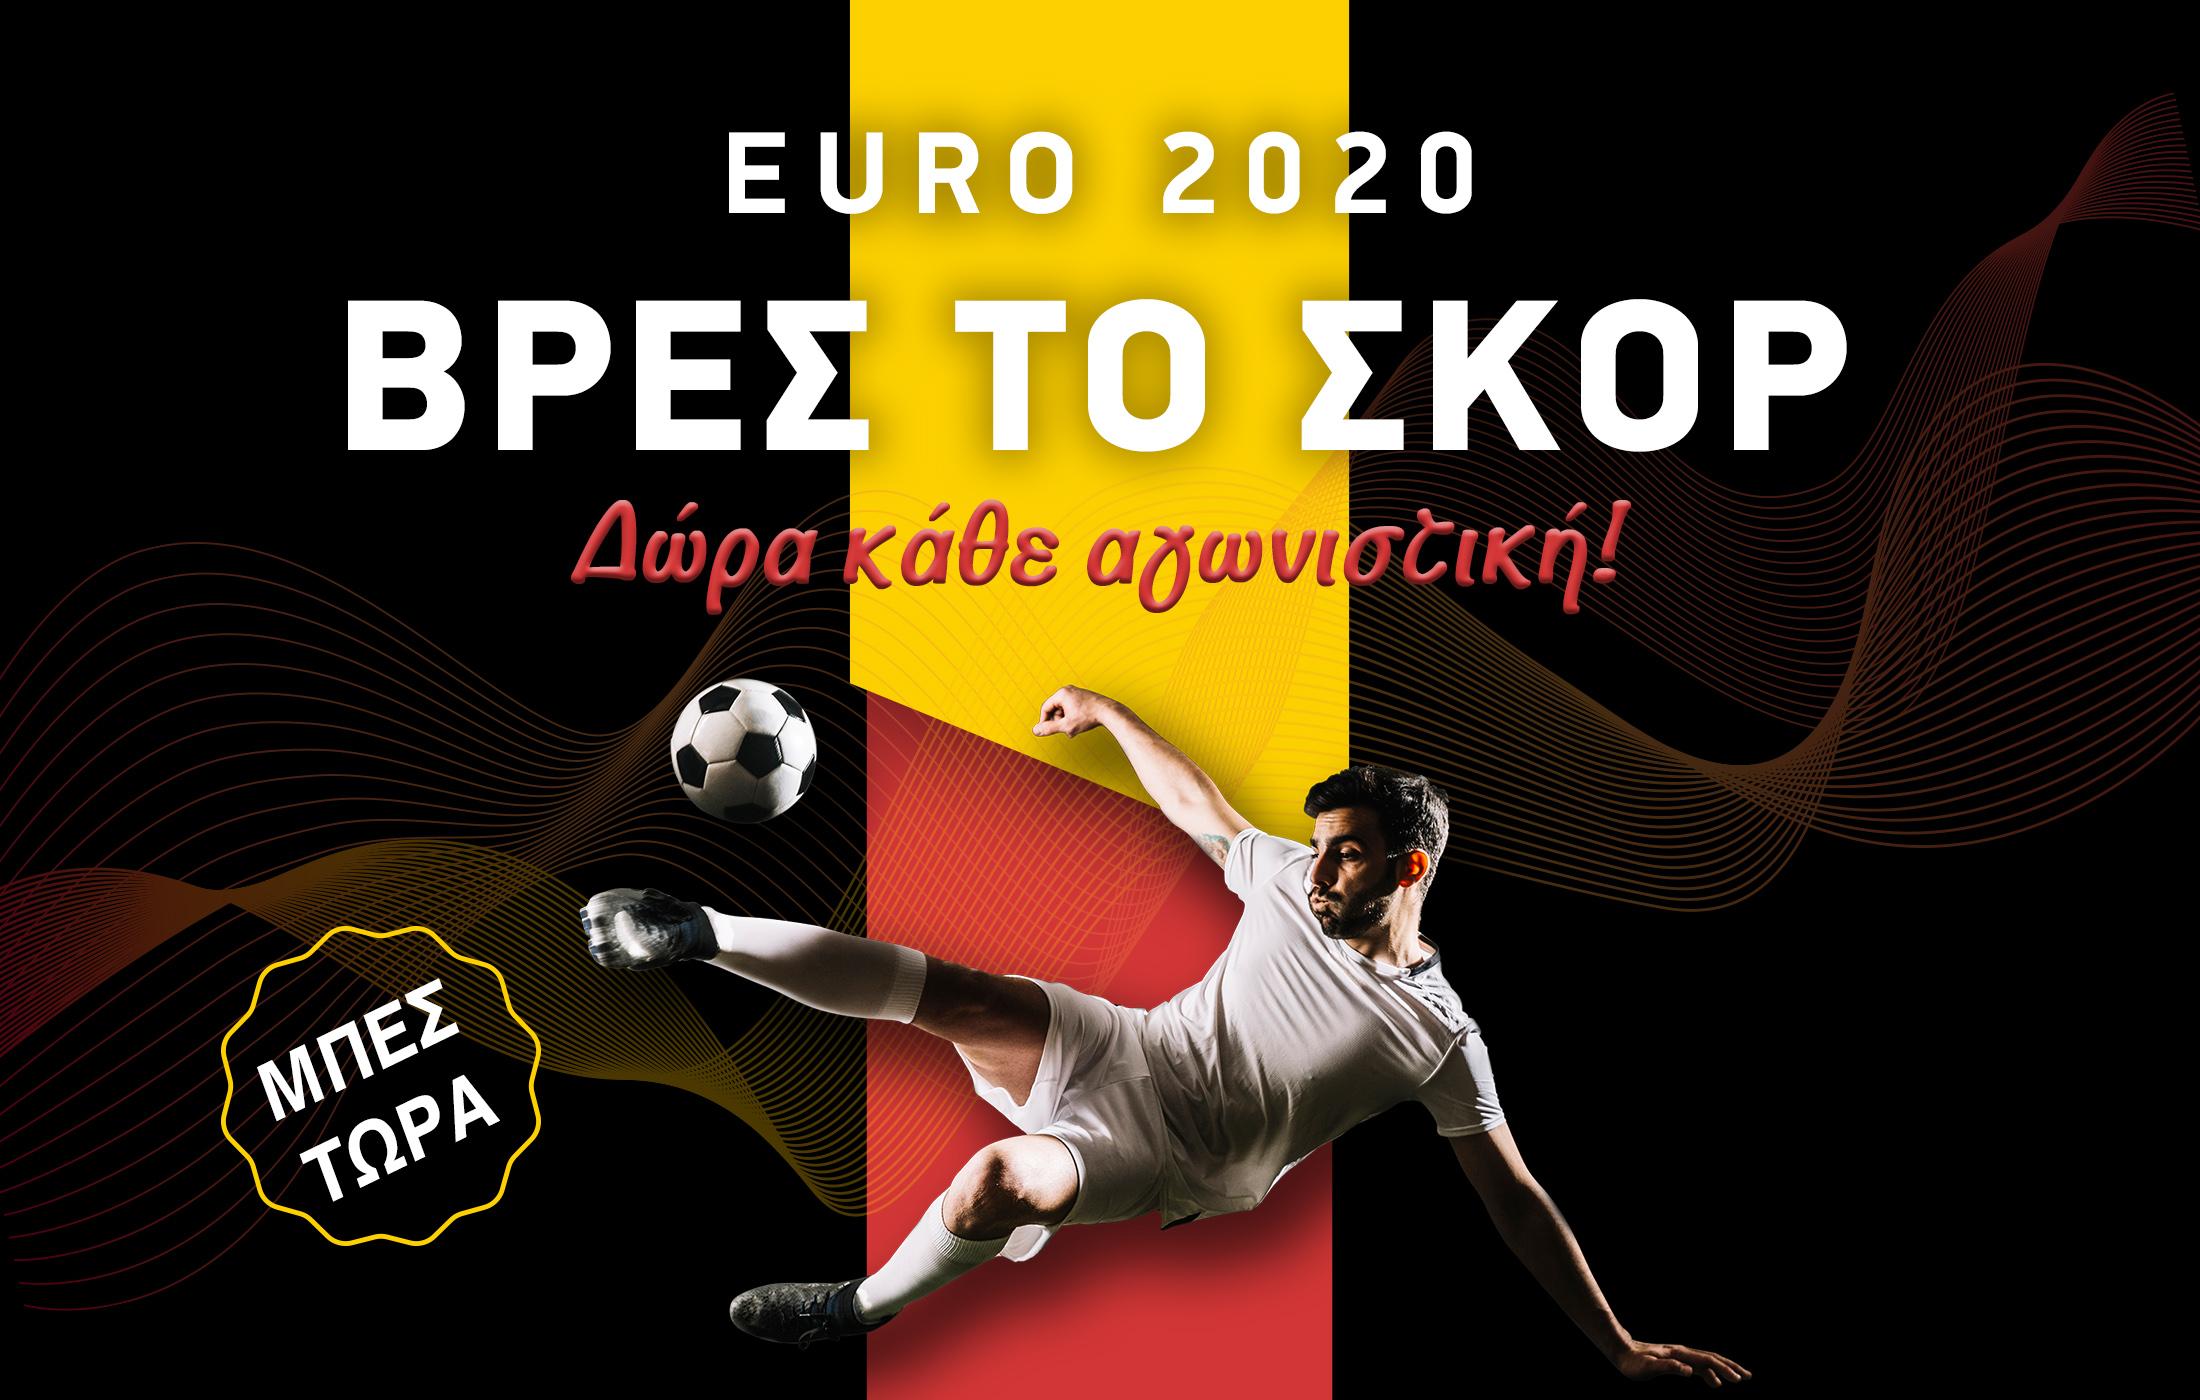 EURO2020-ΒΡΕΣ ΤΟ ΣΚΟΡ.jpg